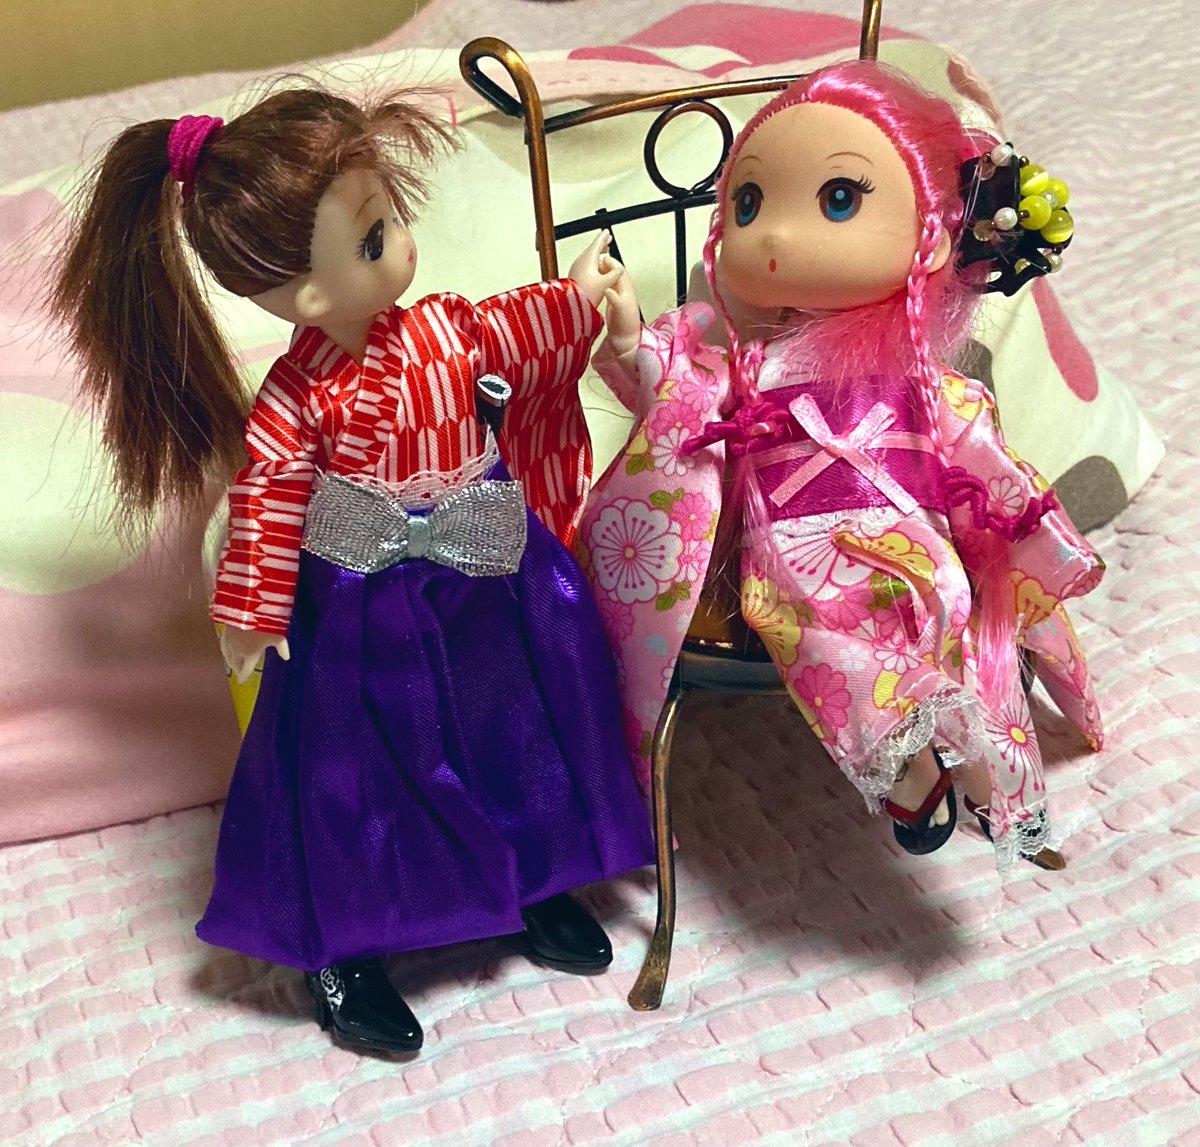 test ツイッターメディア - 【ドール苦手な人閲覧注意】  姫と女剣士の友情的なシチュエーション  #セリアドール #セリア #ダイソー #エリーちゃん服 #ドール #可動式ドールボディ https://t.co/rKhcVhsefK